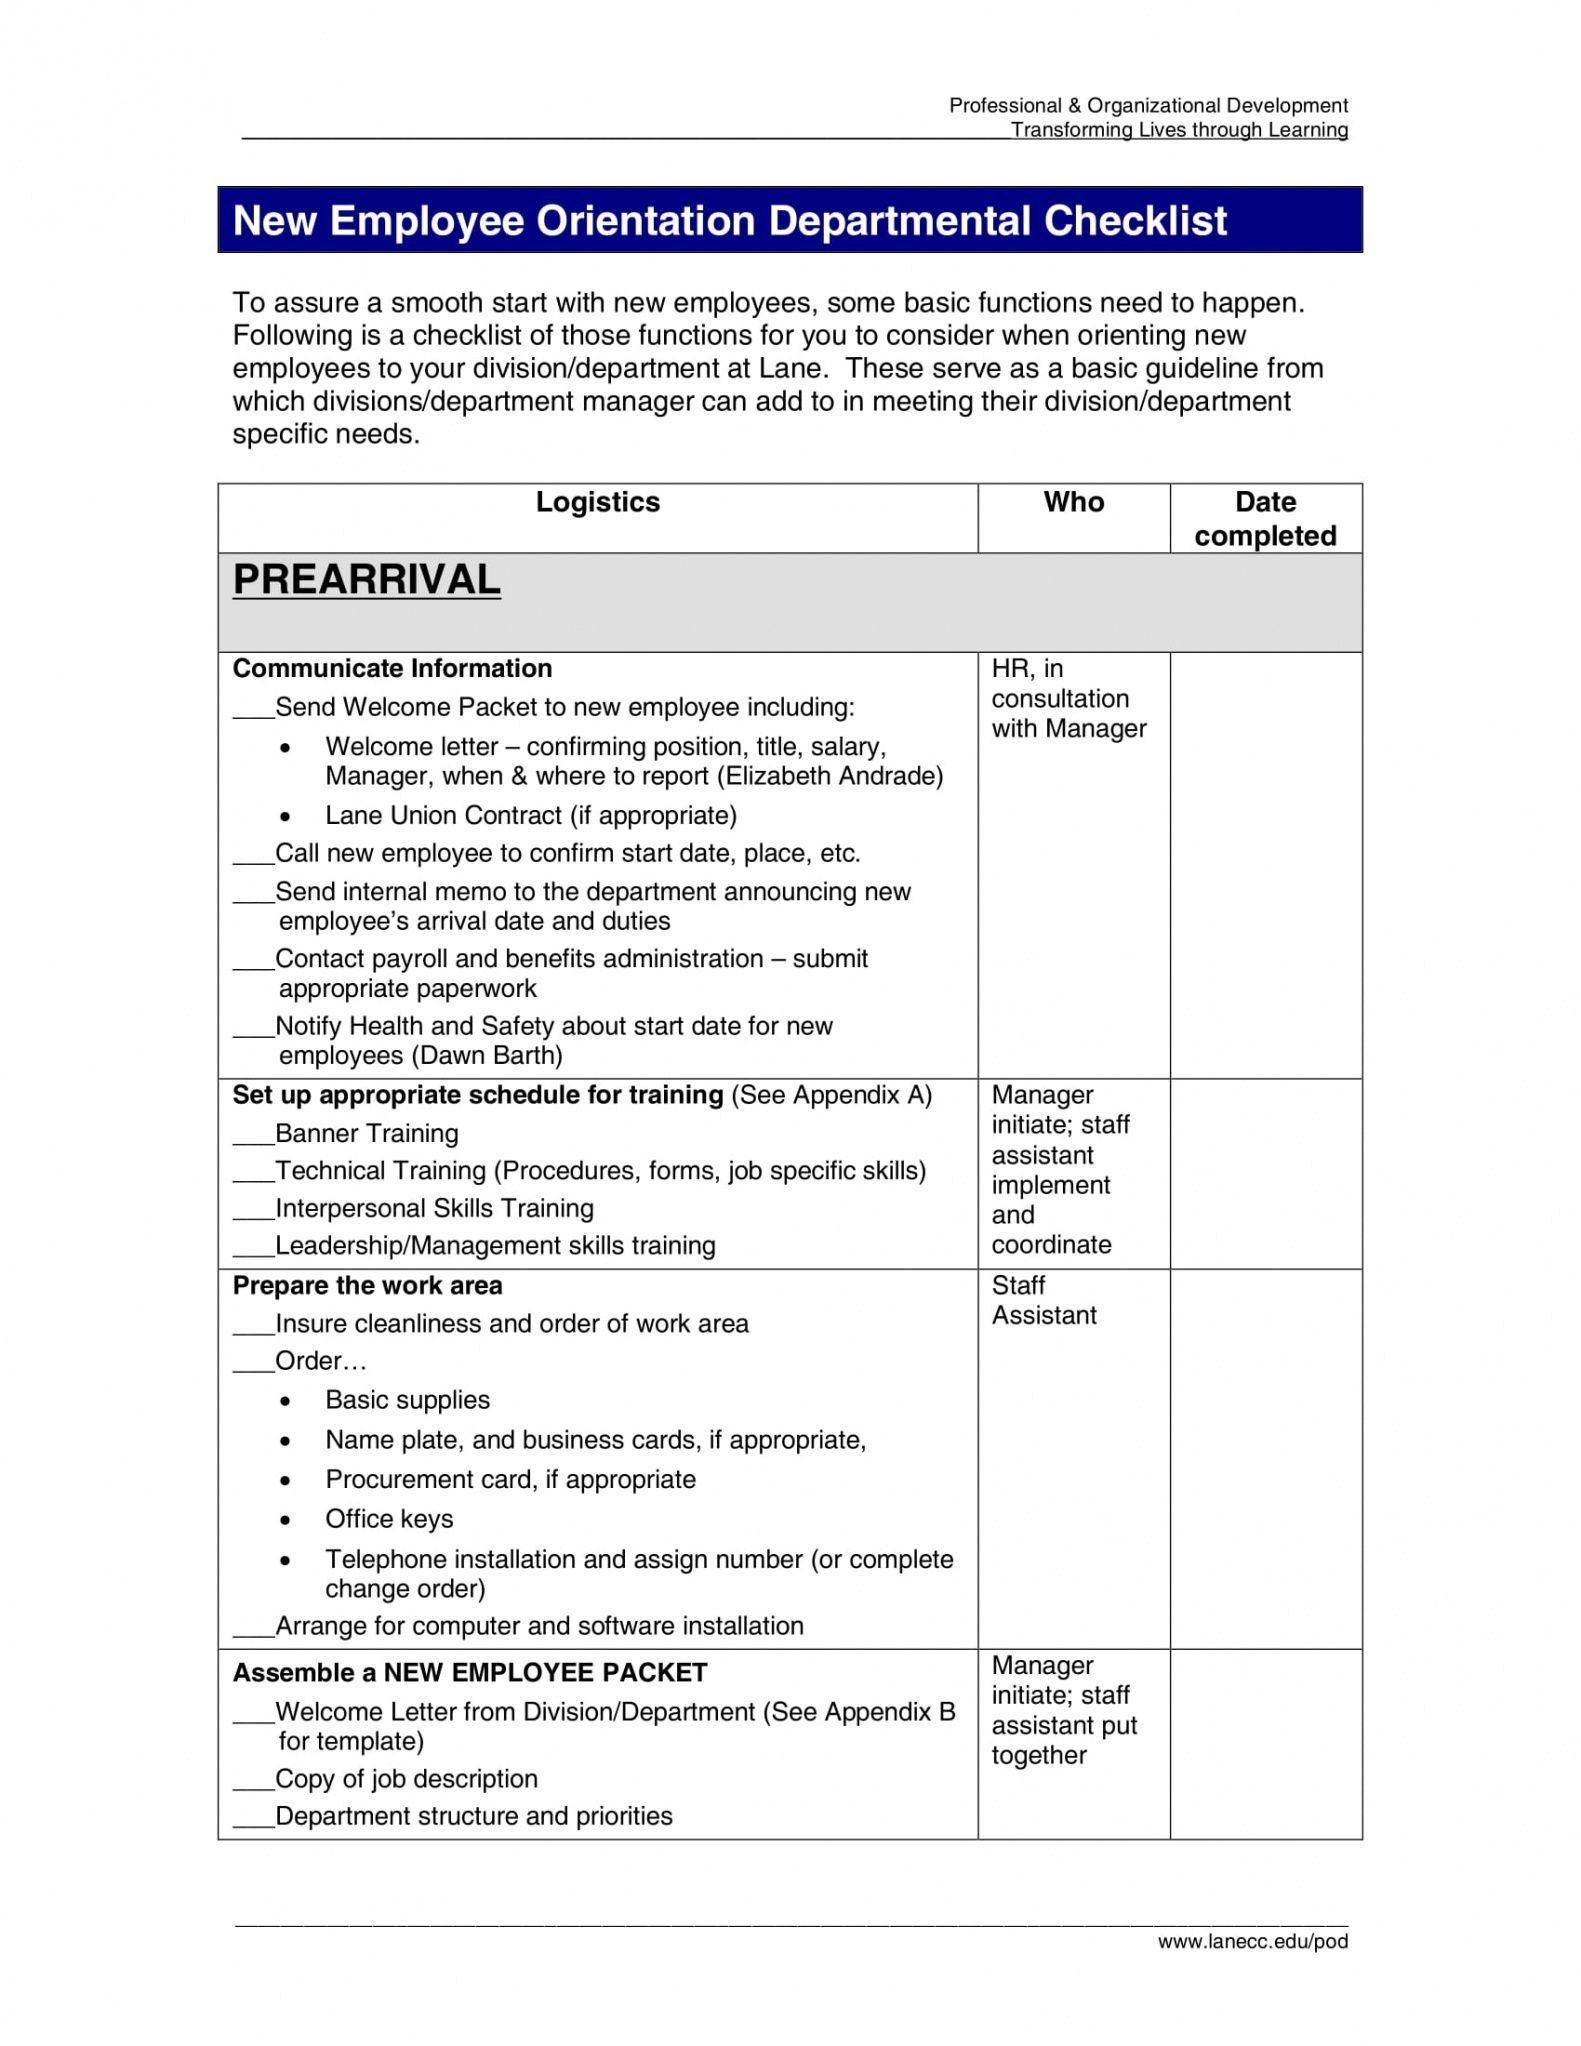 14 New Employee Orientation Program Checklist Pdf Examples New Employee Orientation Agenda New Employee Orientation Agenda Template Orientation Programme New hire orientation checklist template